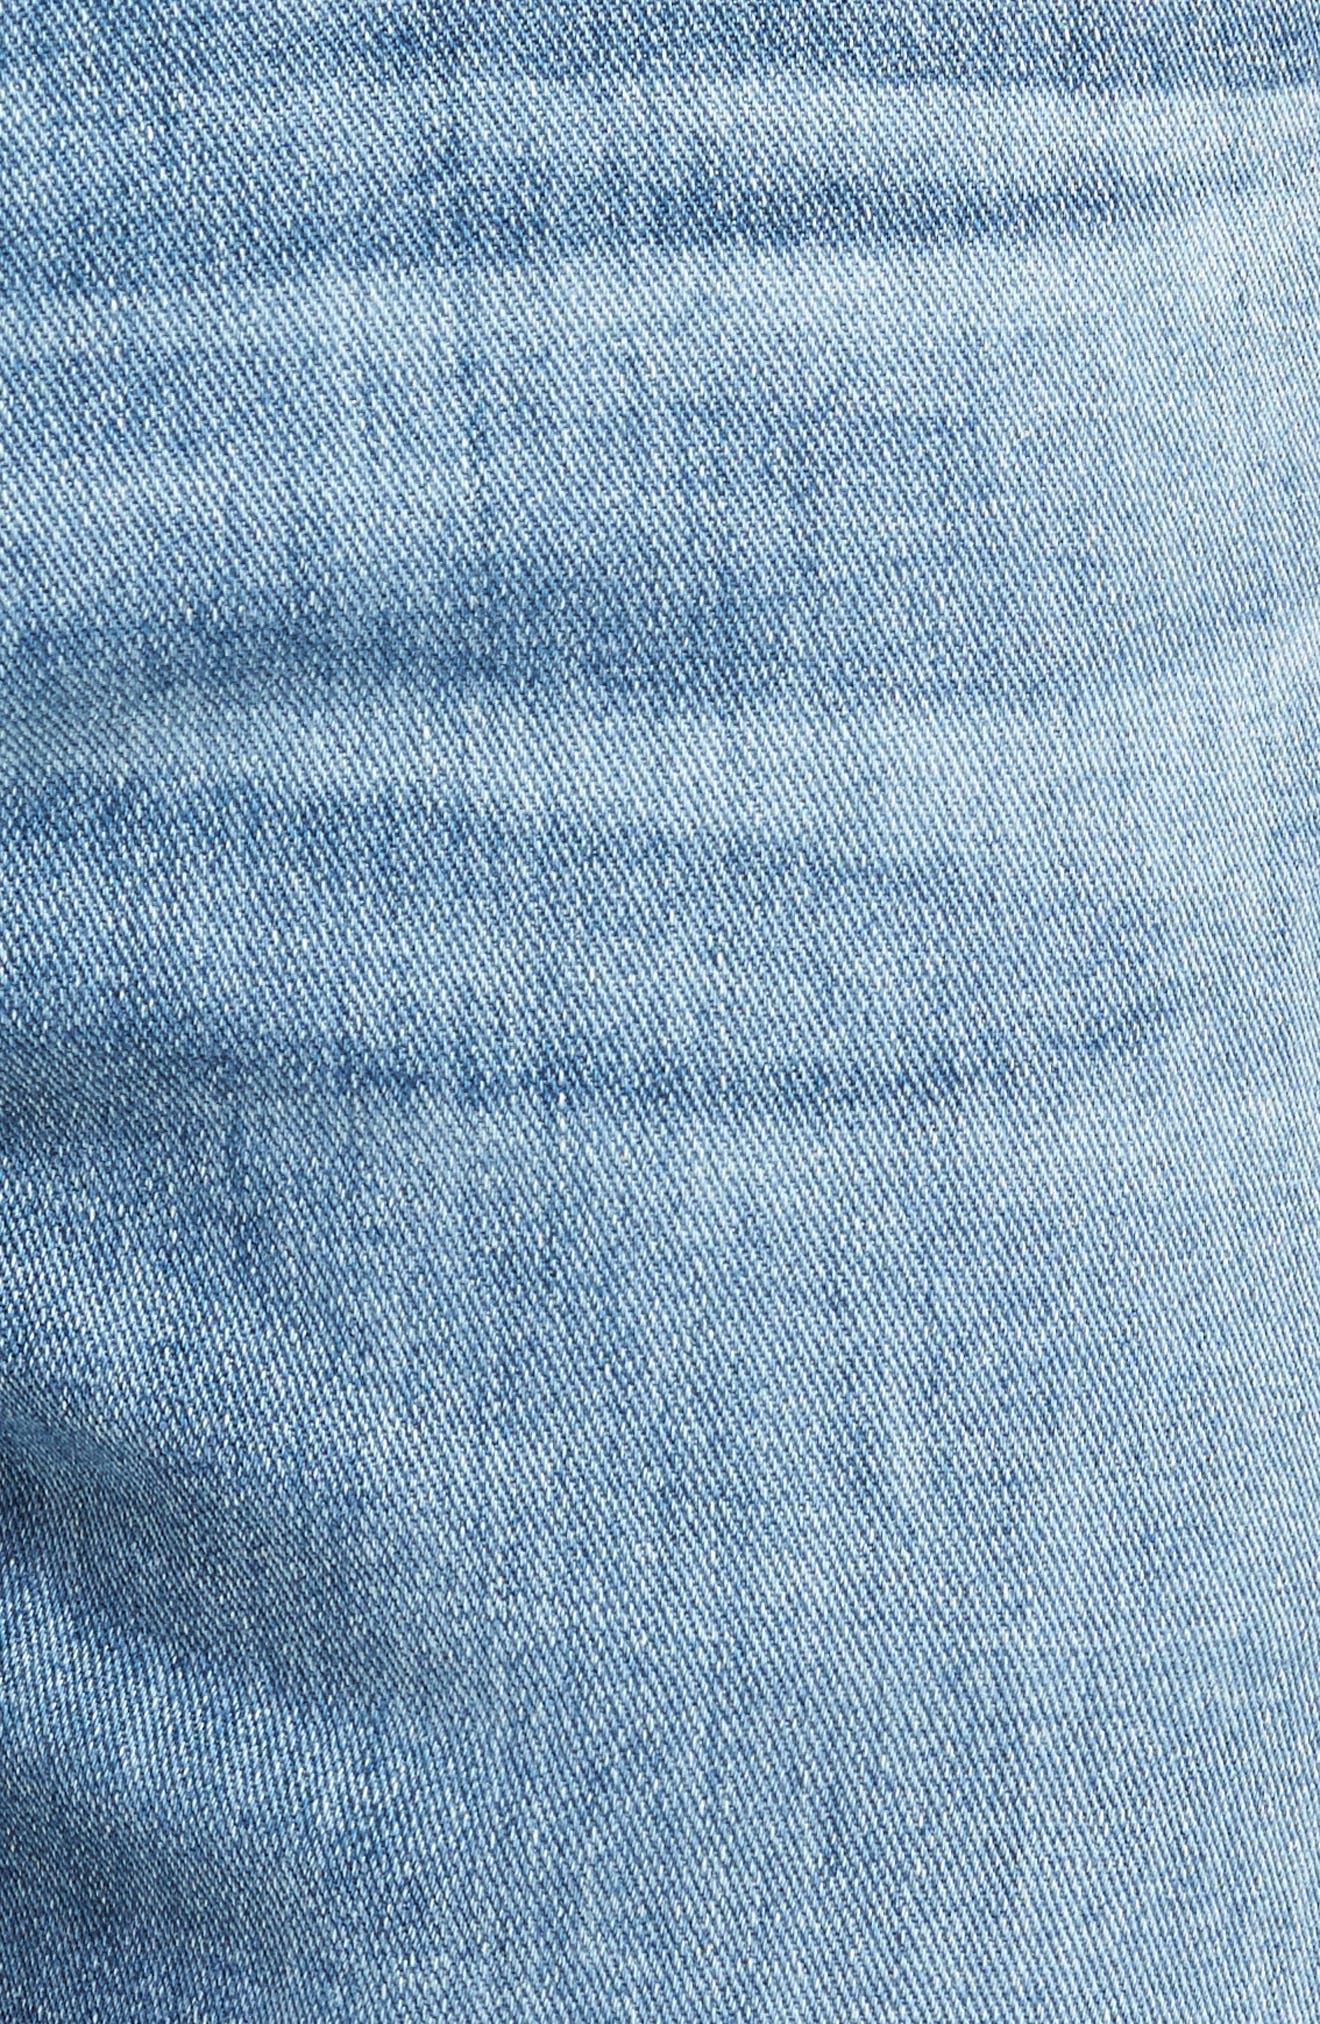 Graduate Slim Straight Leg Jeans,                             Alternate thumbnail 5, color,                             Sandpiper